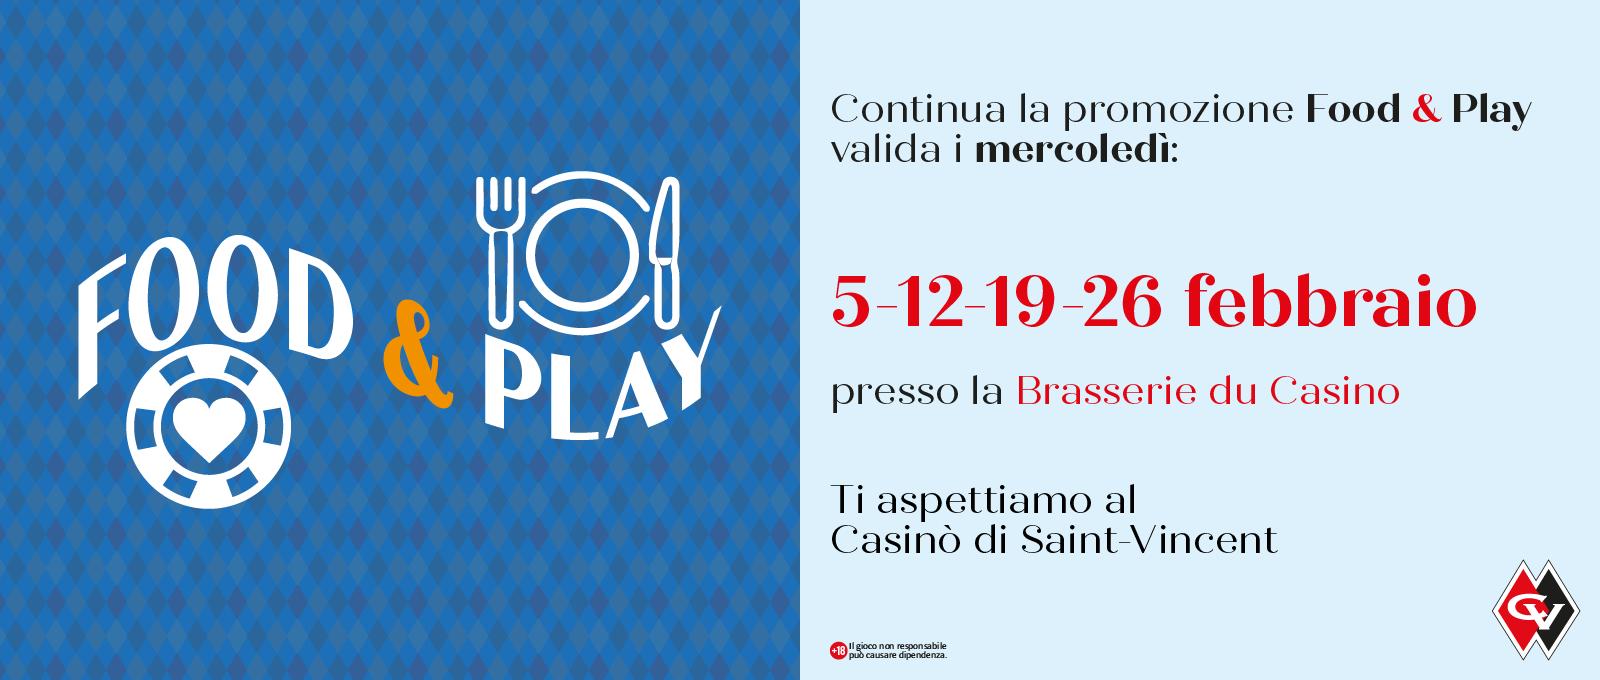 Food & Play